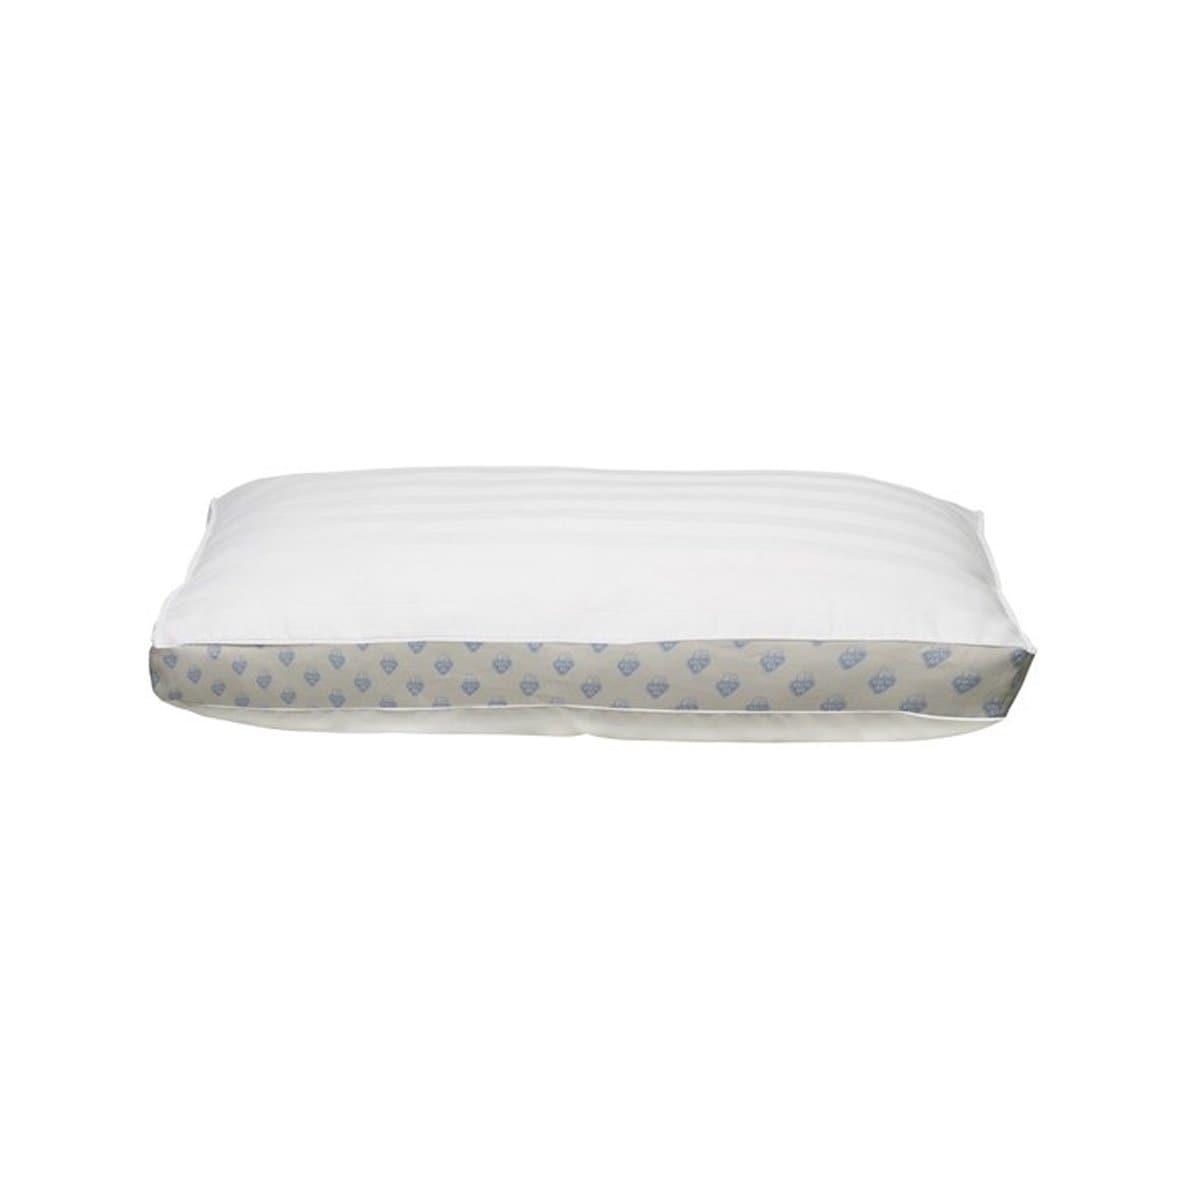 Almohada Comfort Plus Spring Air - Estándar